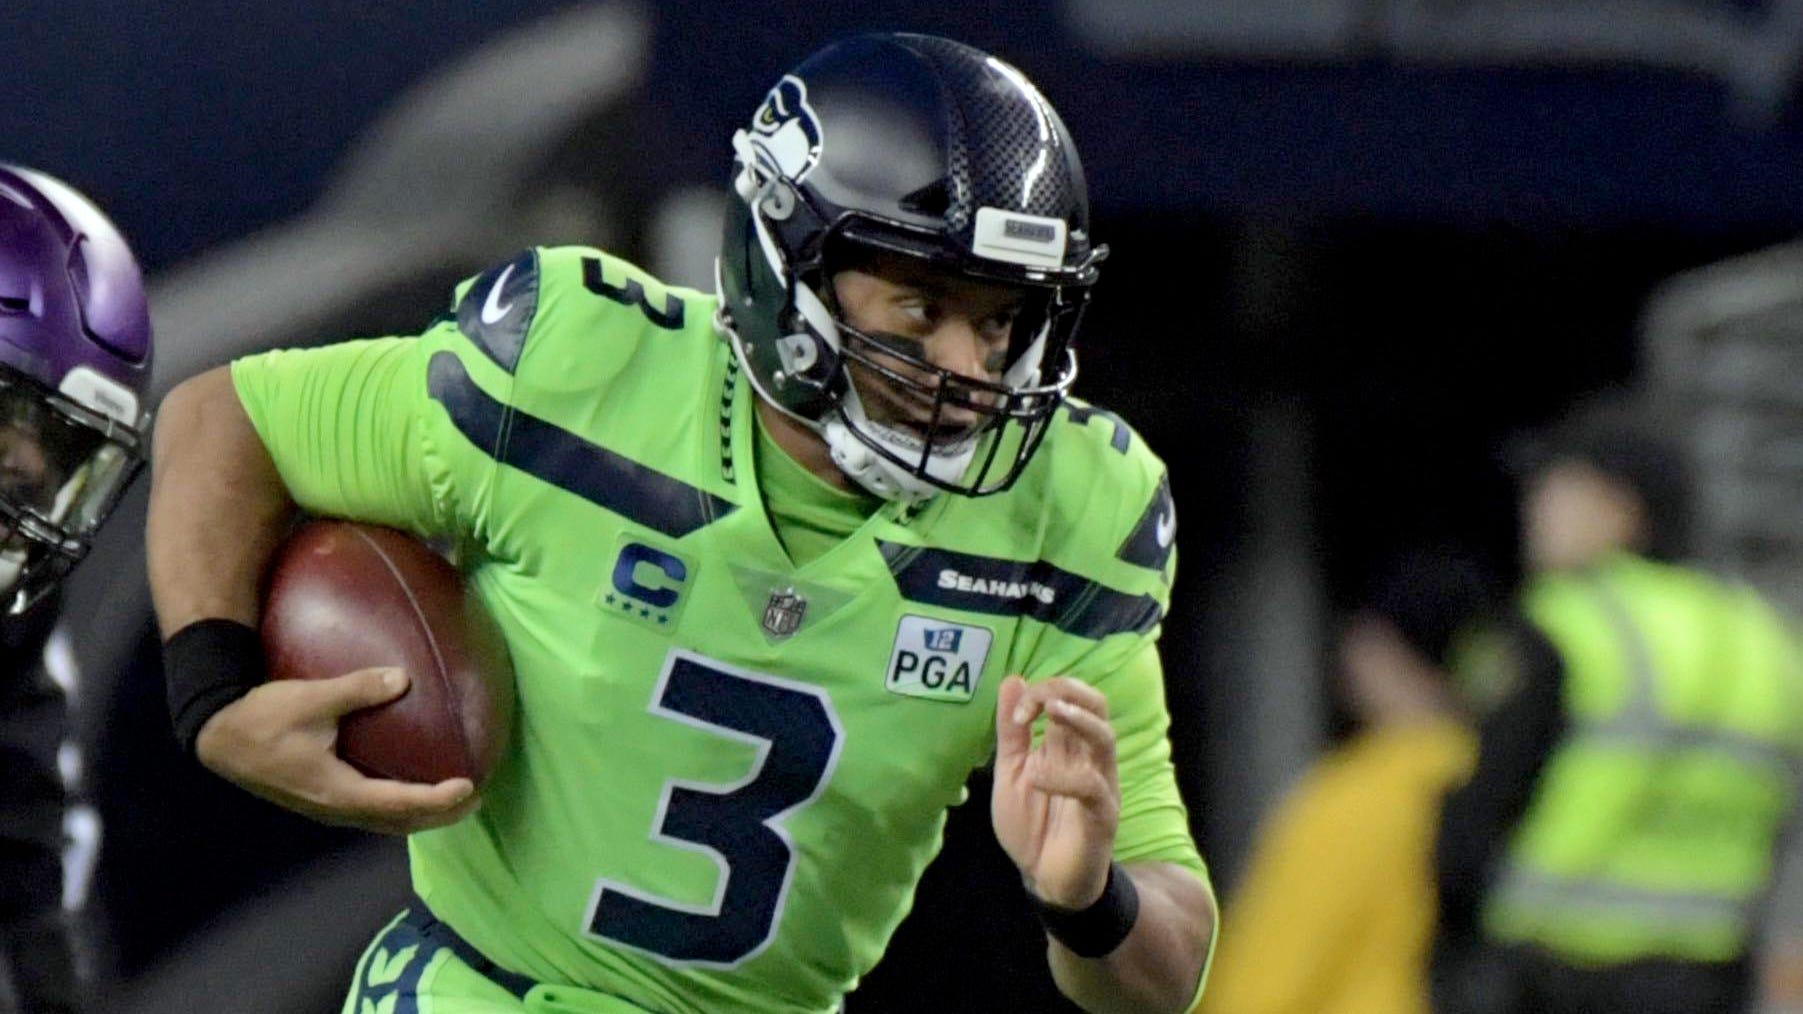 Seahawks QB Russell Wilson provided a winning, if inconsistent, effort Monday night.